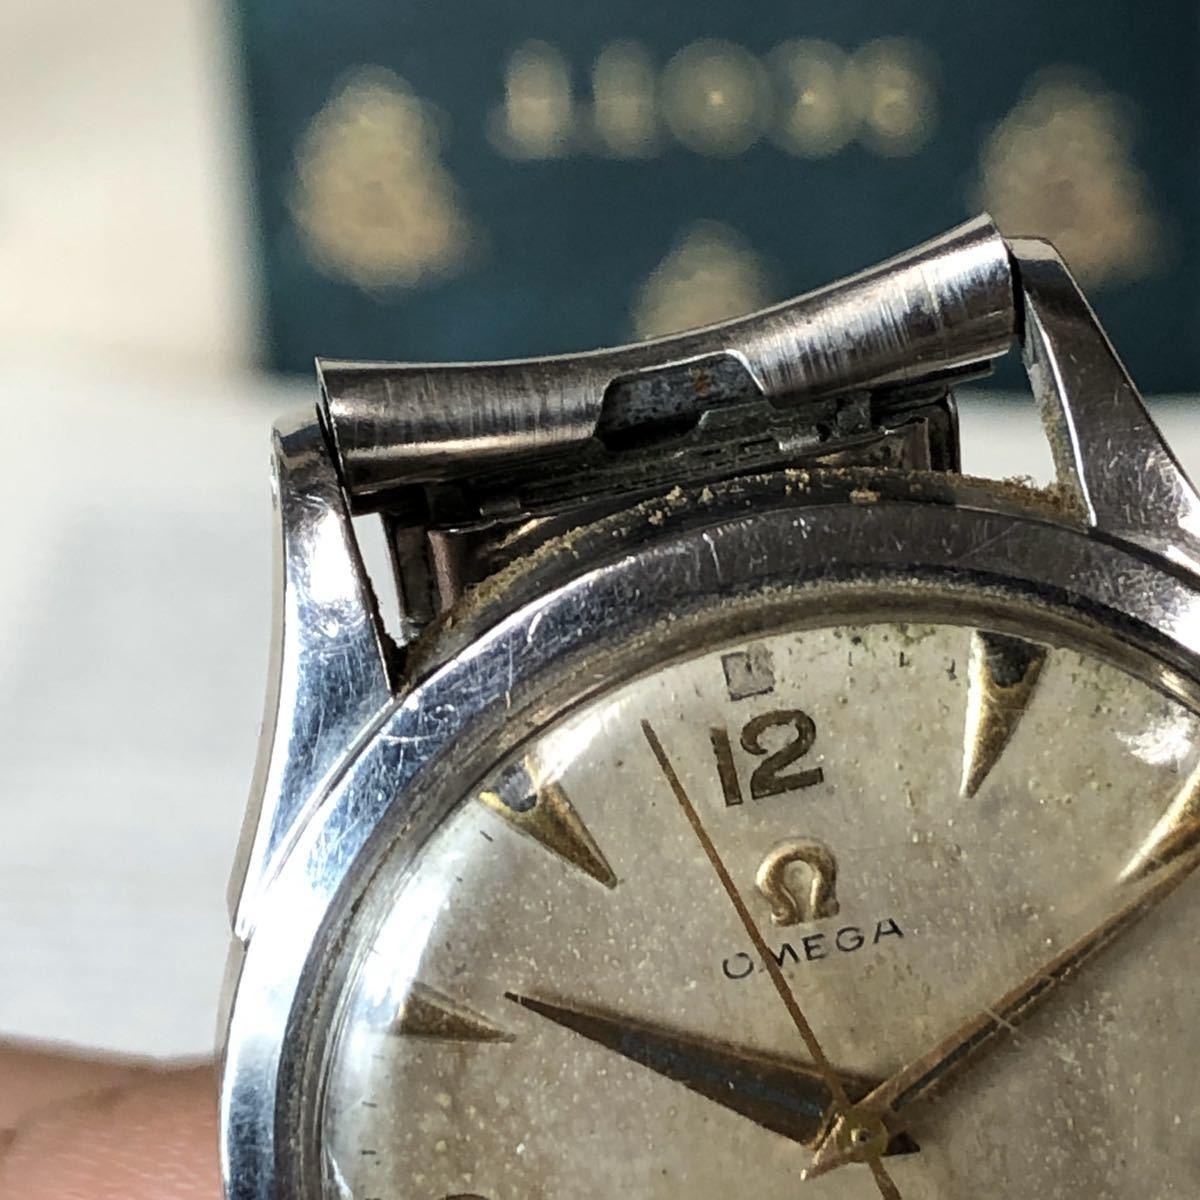 OMEGA オメガ 腕時計 機械式 自動巻 ハーフロータリー SWISS MADE スイス SS 3針 ビンテージ 希少 値下げ交渉あり 稼動品 W1519_画像10